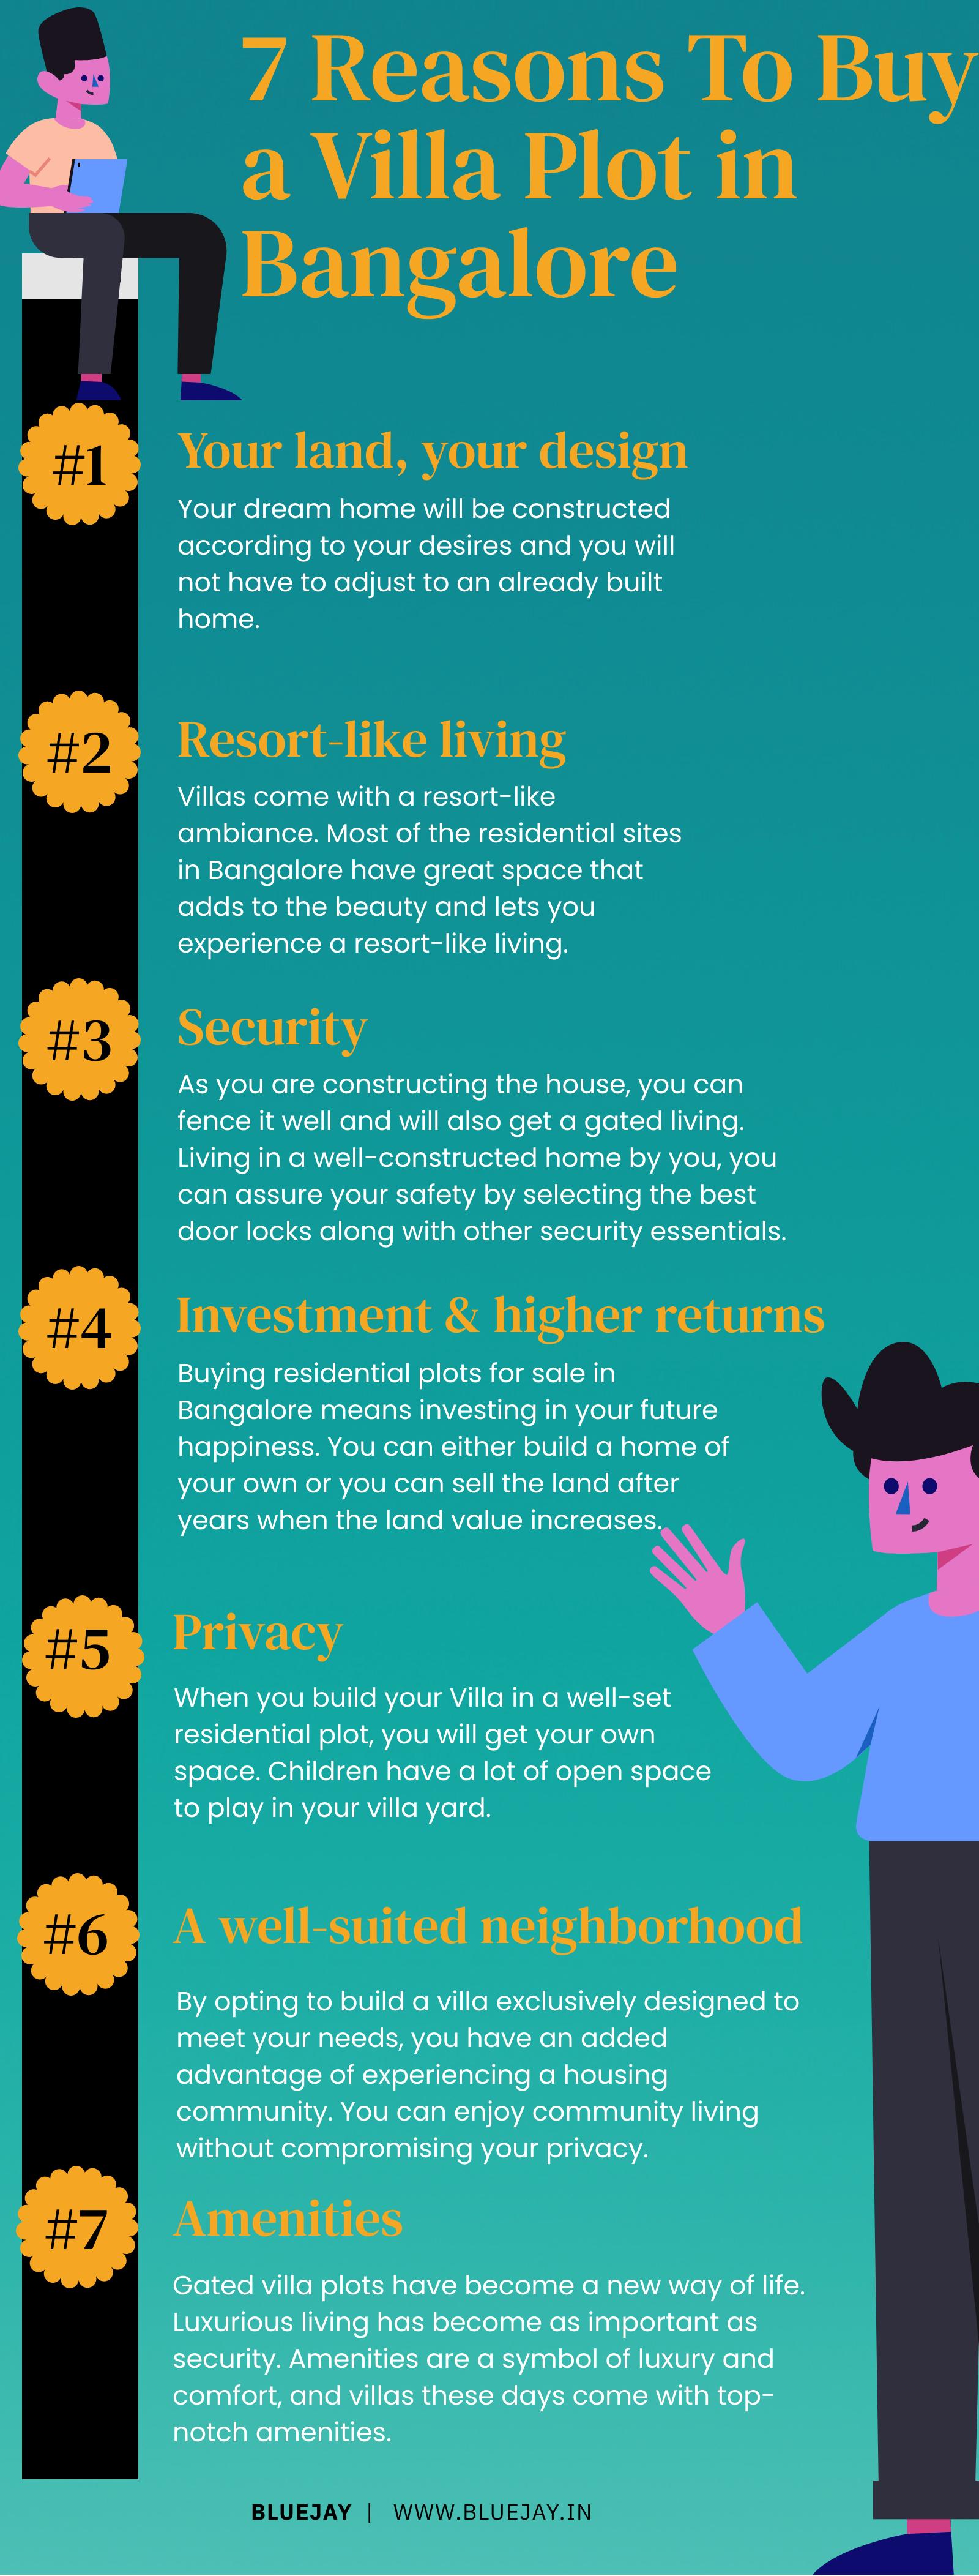 7 Reasons To Buy a Villa Plot in Bangalore